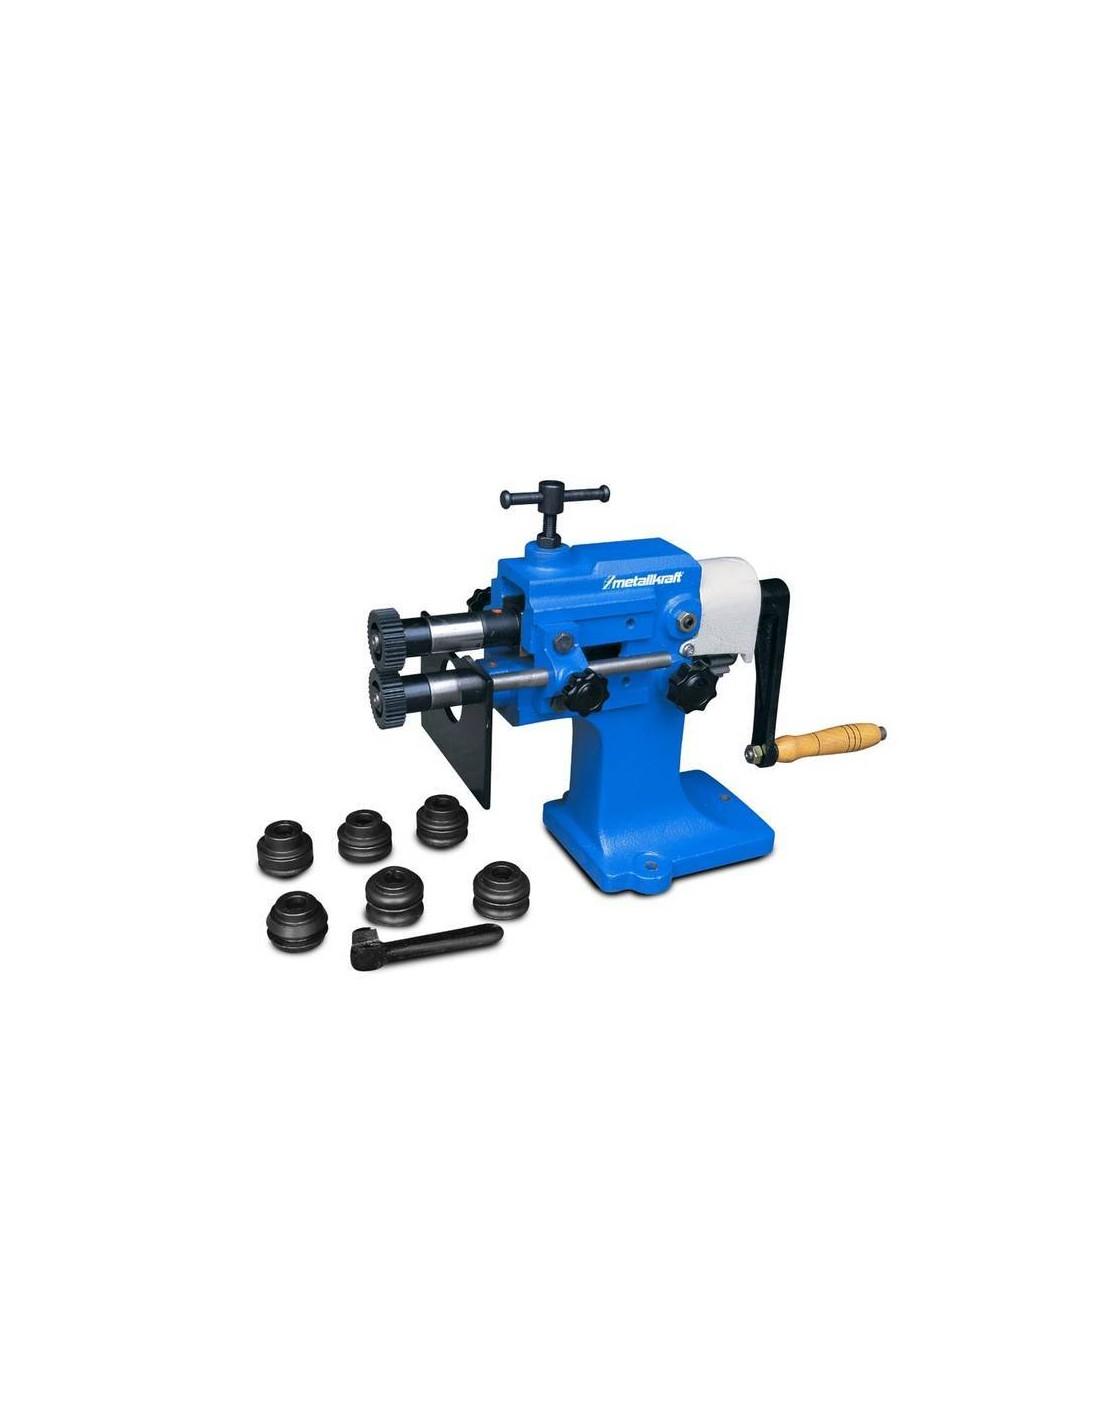 Masina de zencuit manuala Metallkraft SBM 110-08